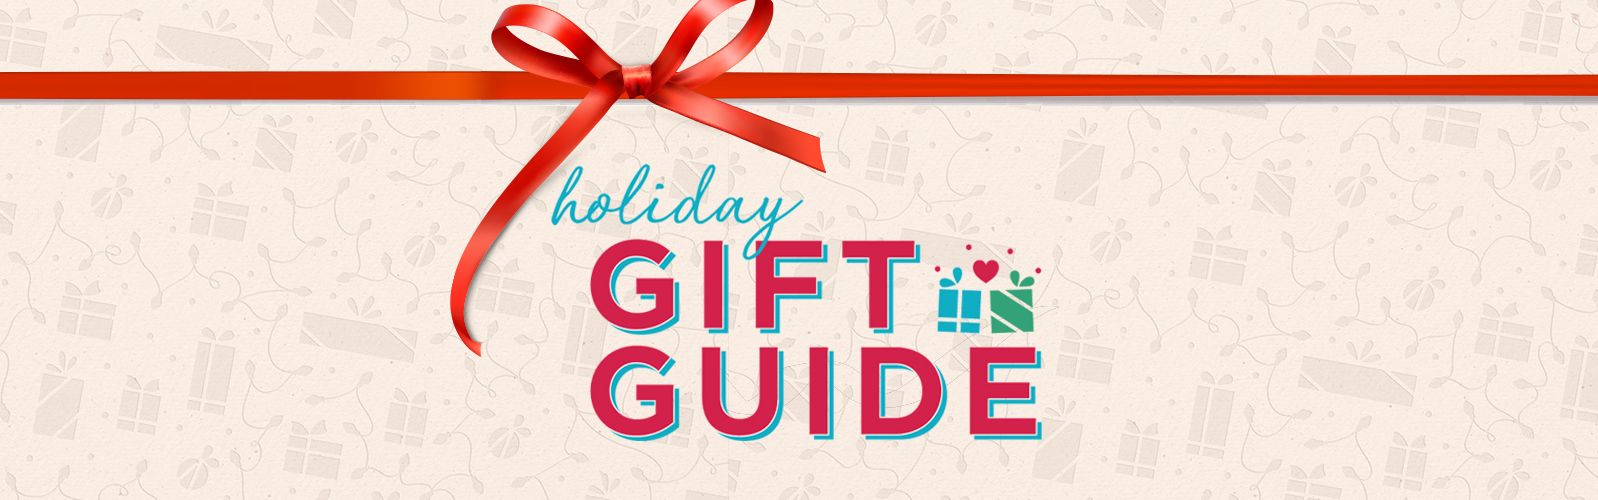 Dean season $10 gift ideas for christmas